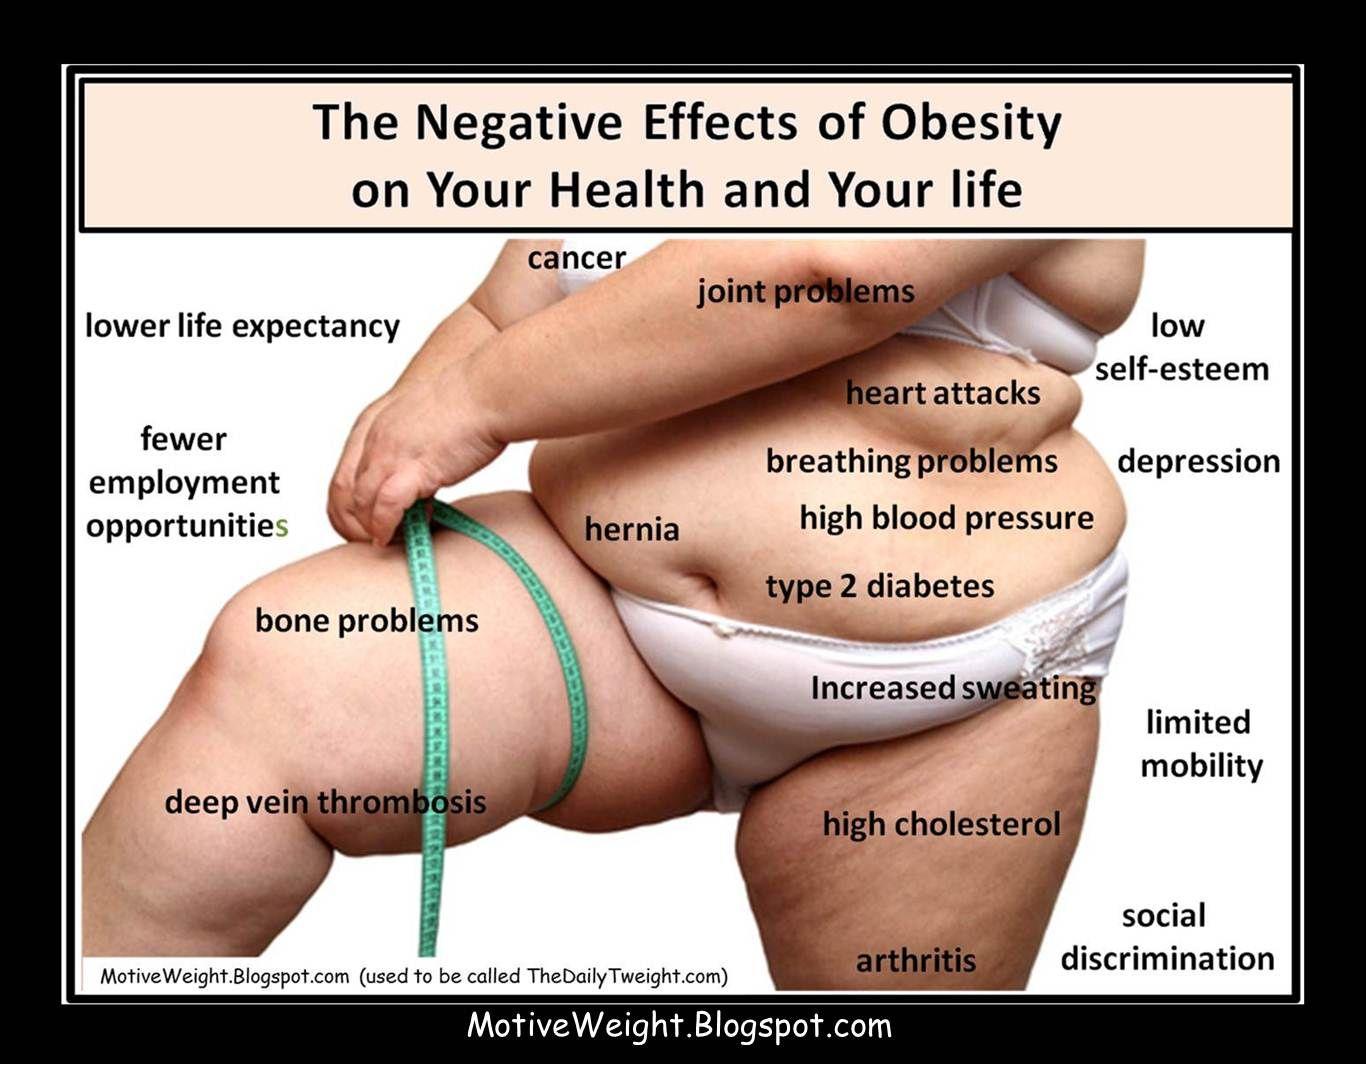 How To Cut Fat From Your Body About 3 10 Kg Month 100 Herbs Click Here Tips Ampuh Menurunkan Berat Badan 3 10 Kg Bulan 100 Obat Herbal Obesity